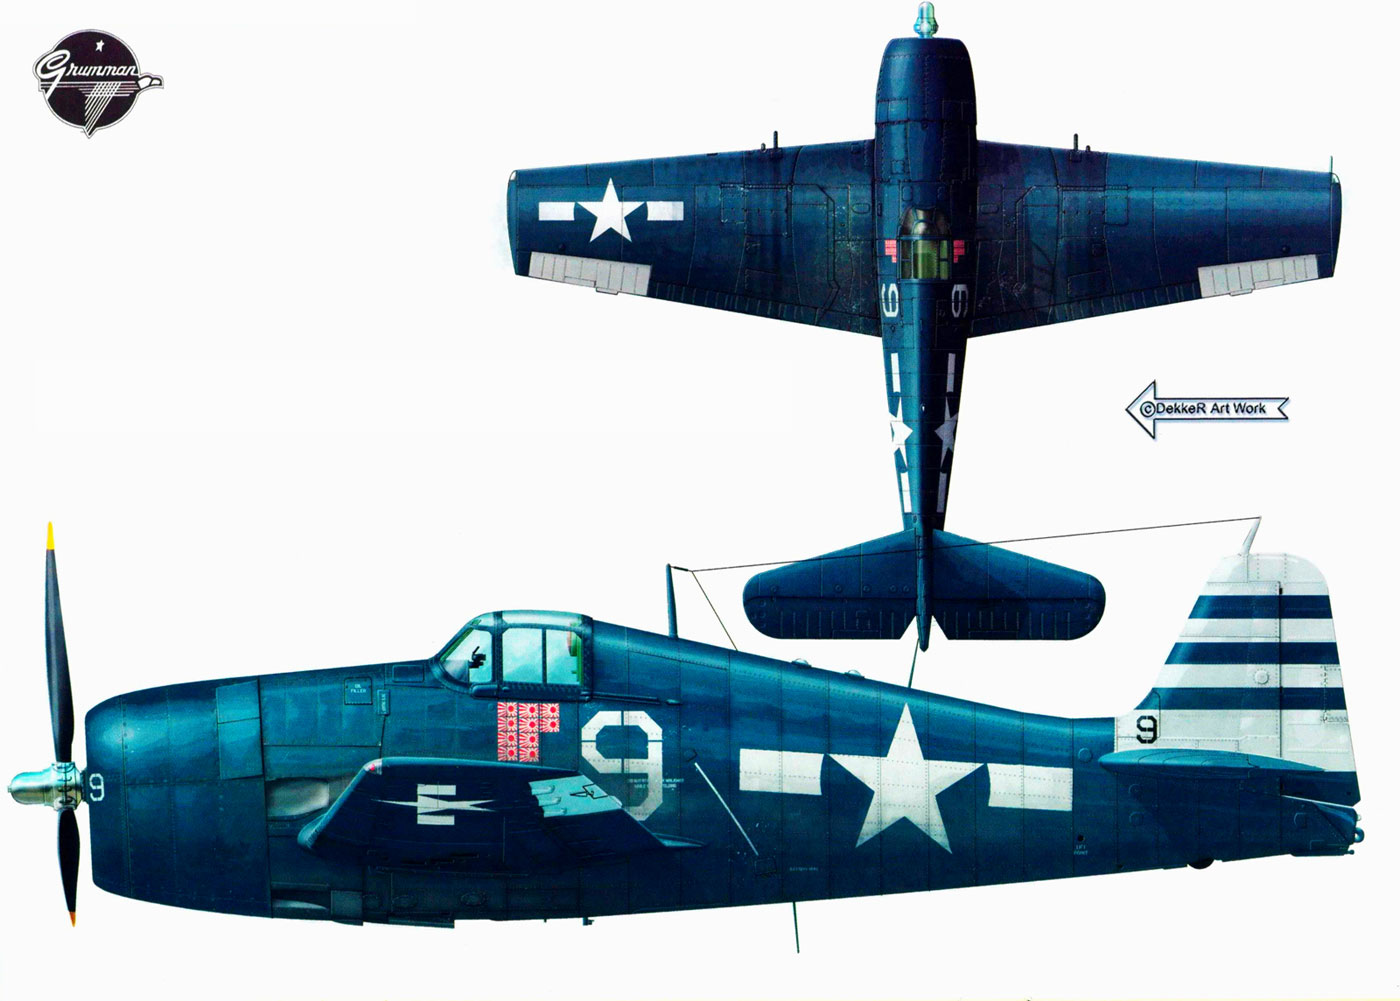 Grumman F6F 5 Hellcat VF 12 White